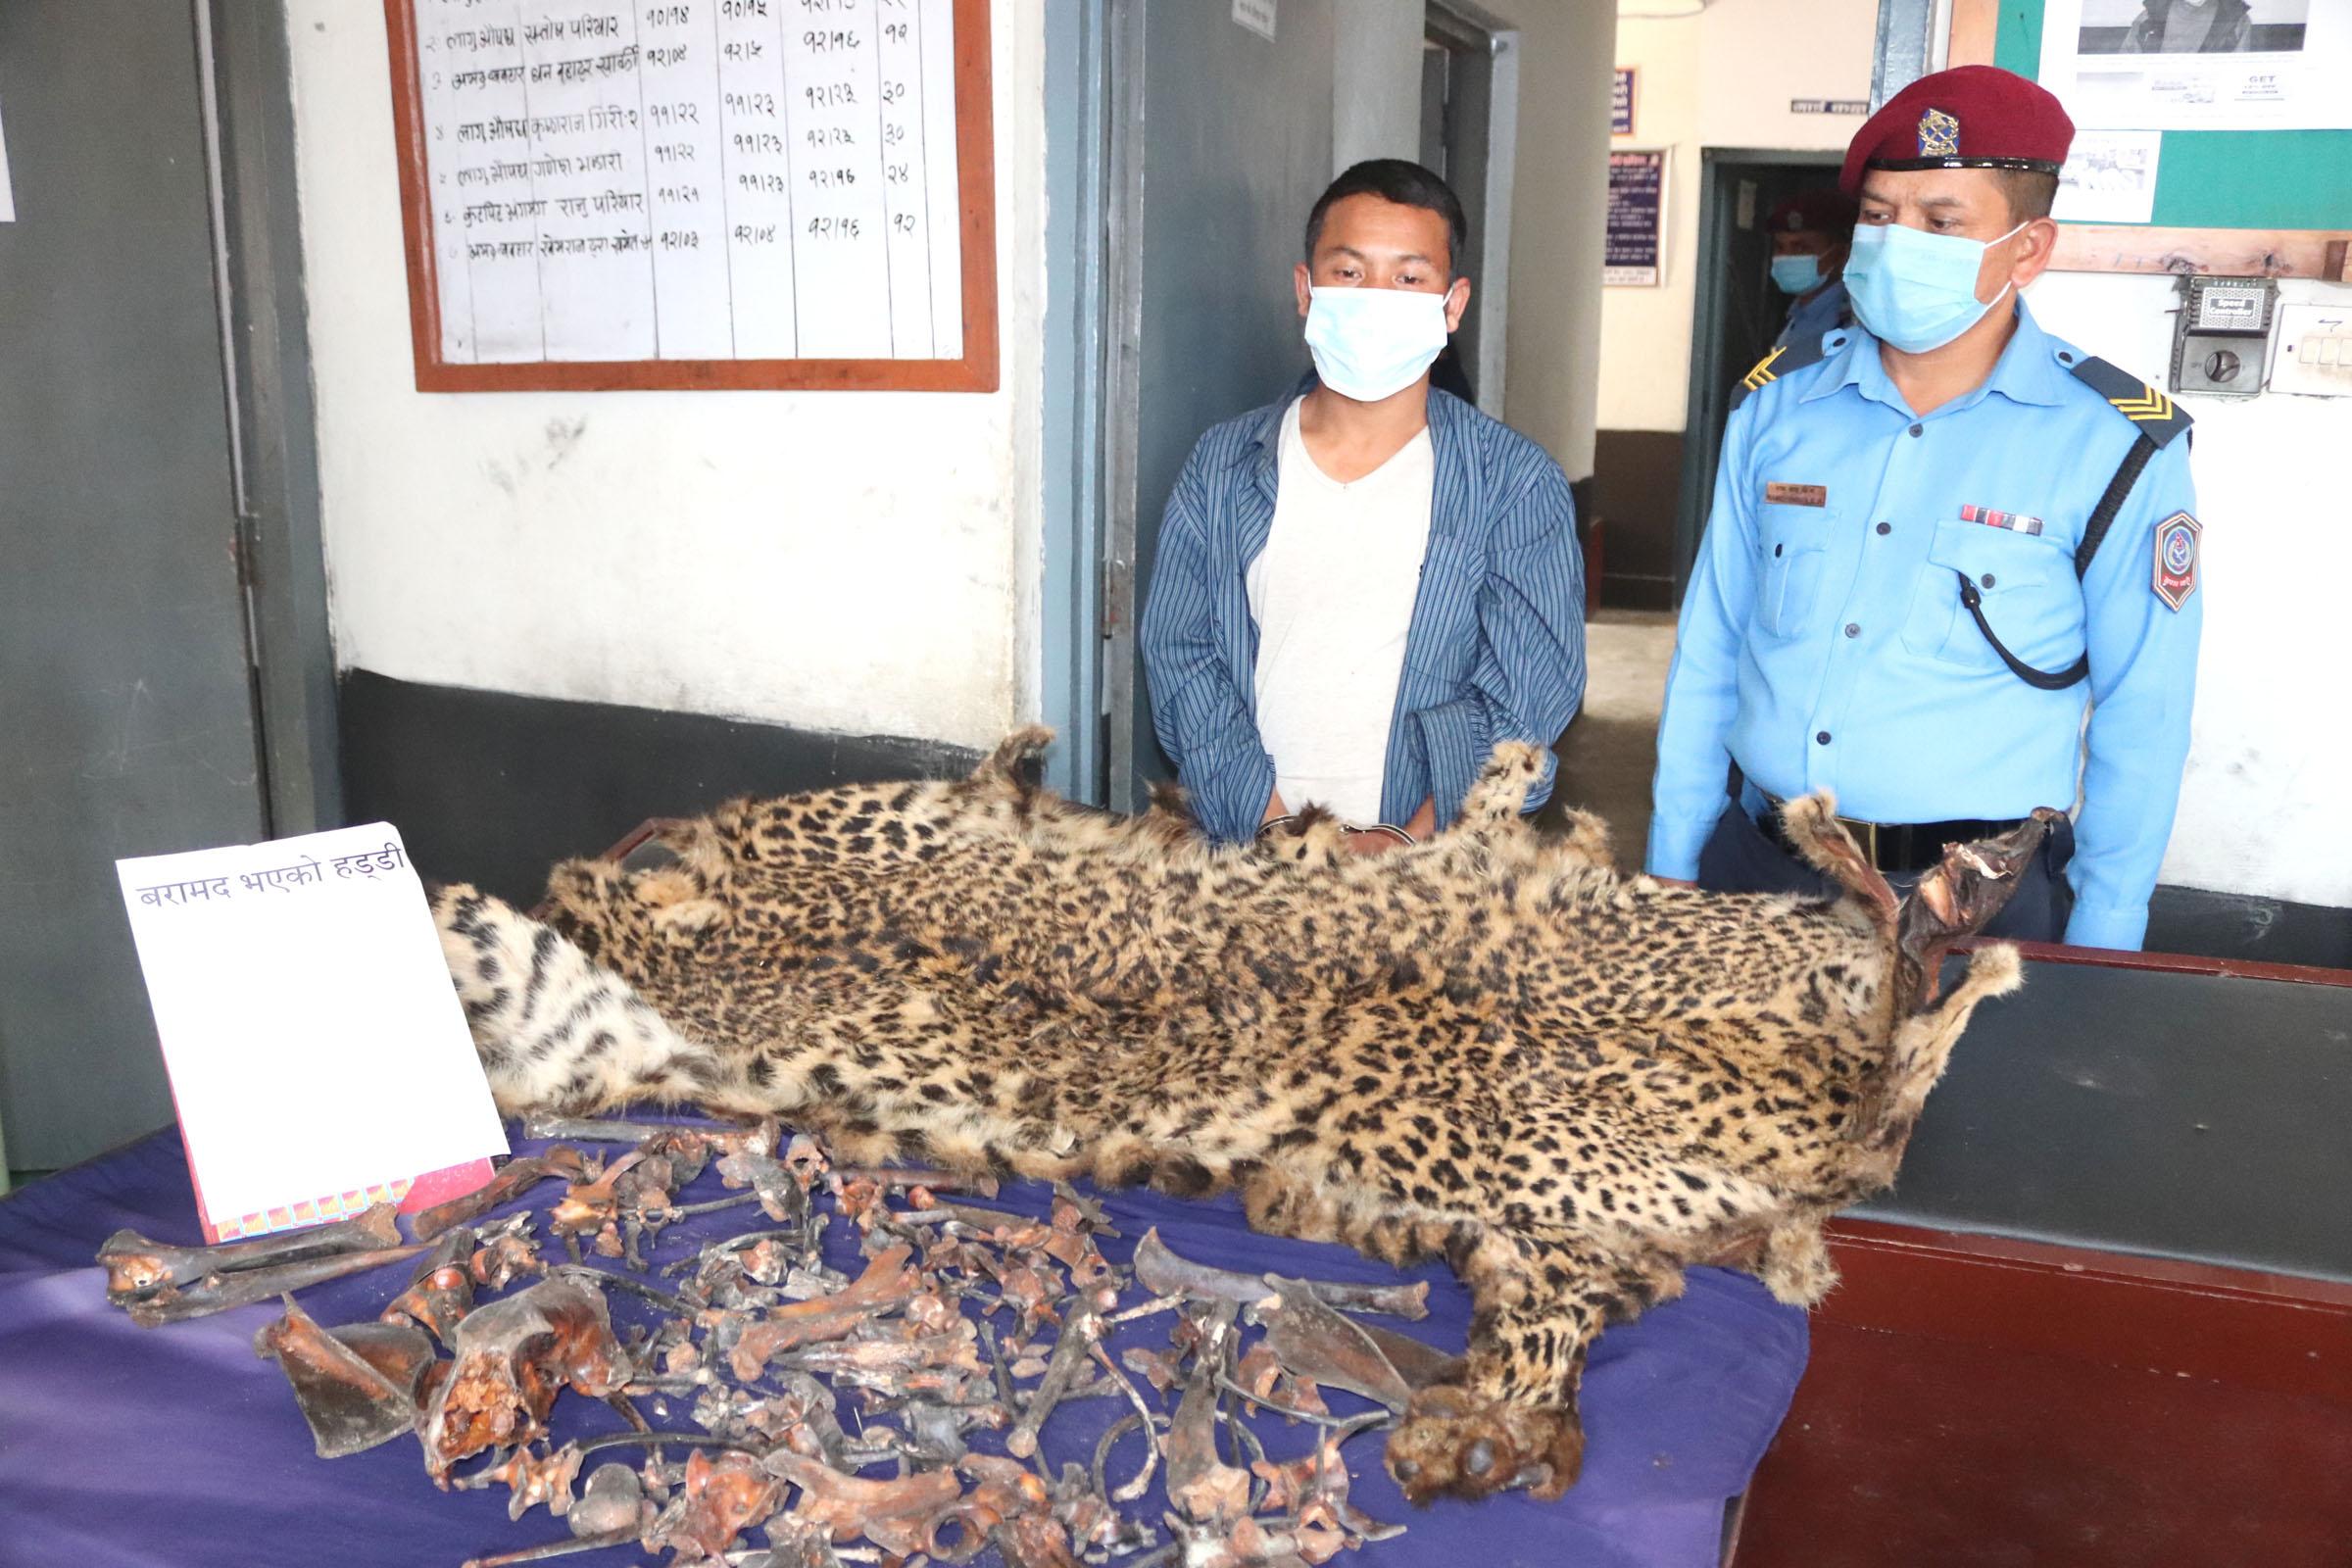 arrested with tiger skin